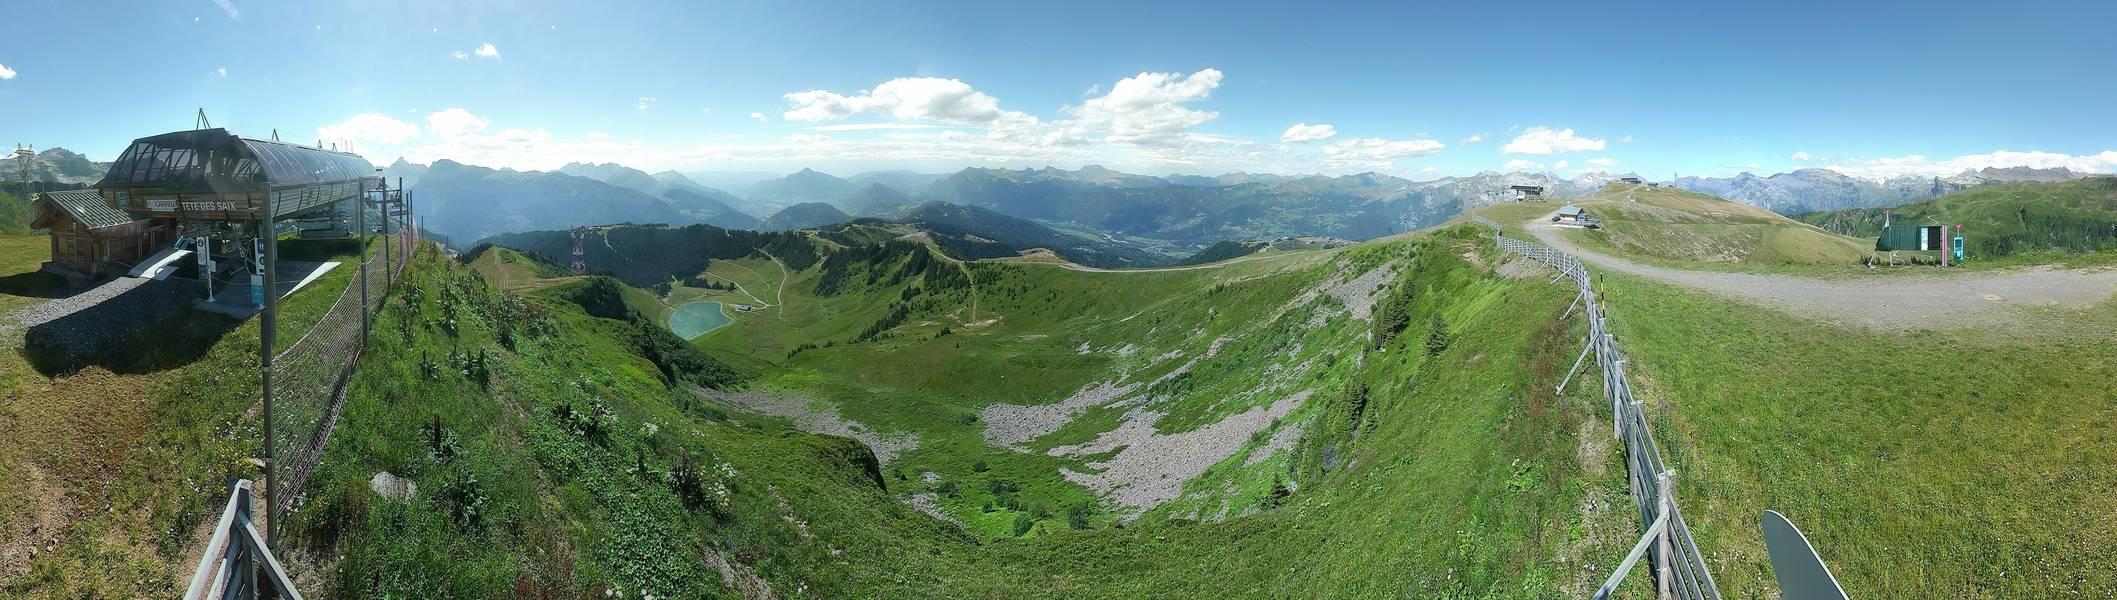 les-Carroz-ski-station des-saix